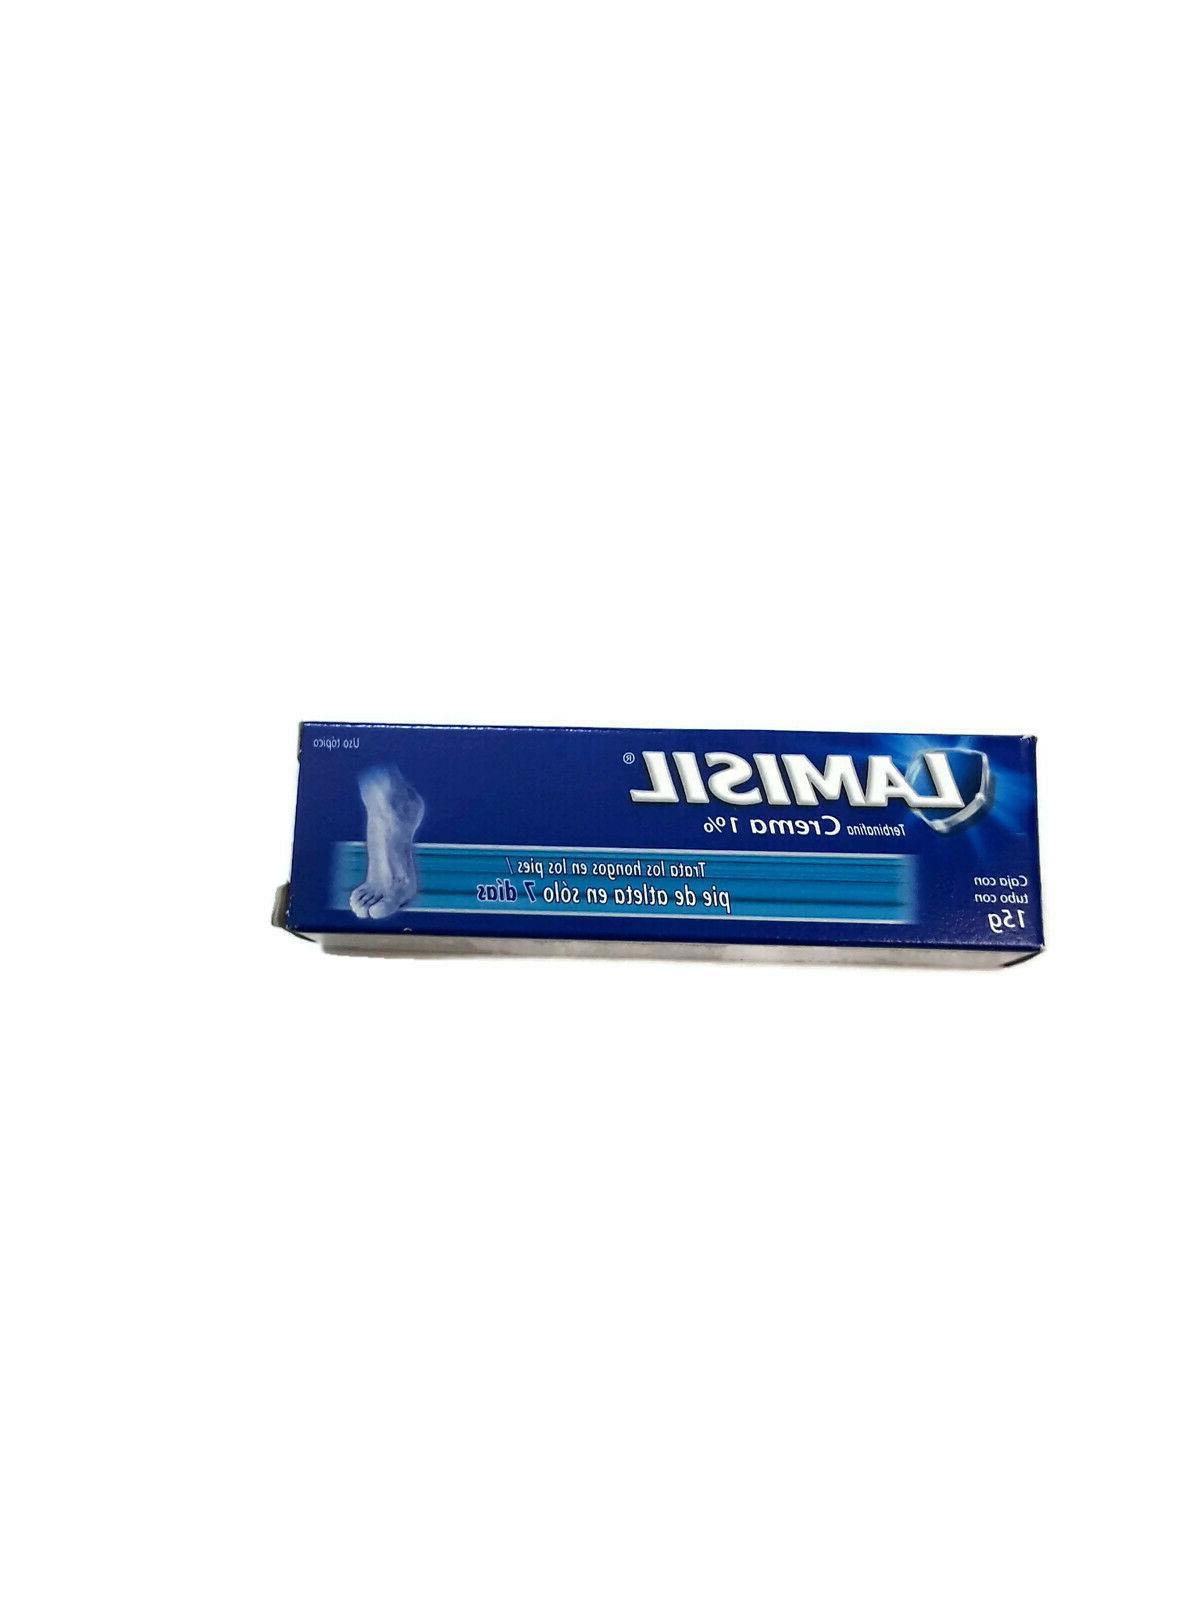 LAMISIL Athletes Cream Tubes 30g+30g+15g